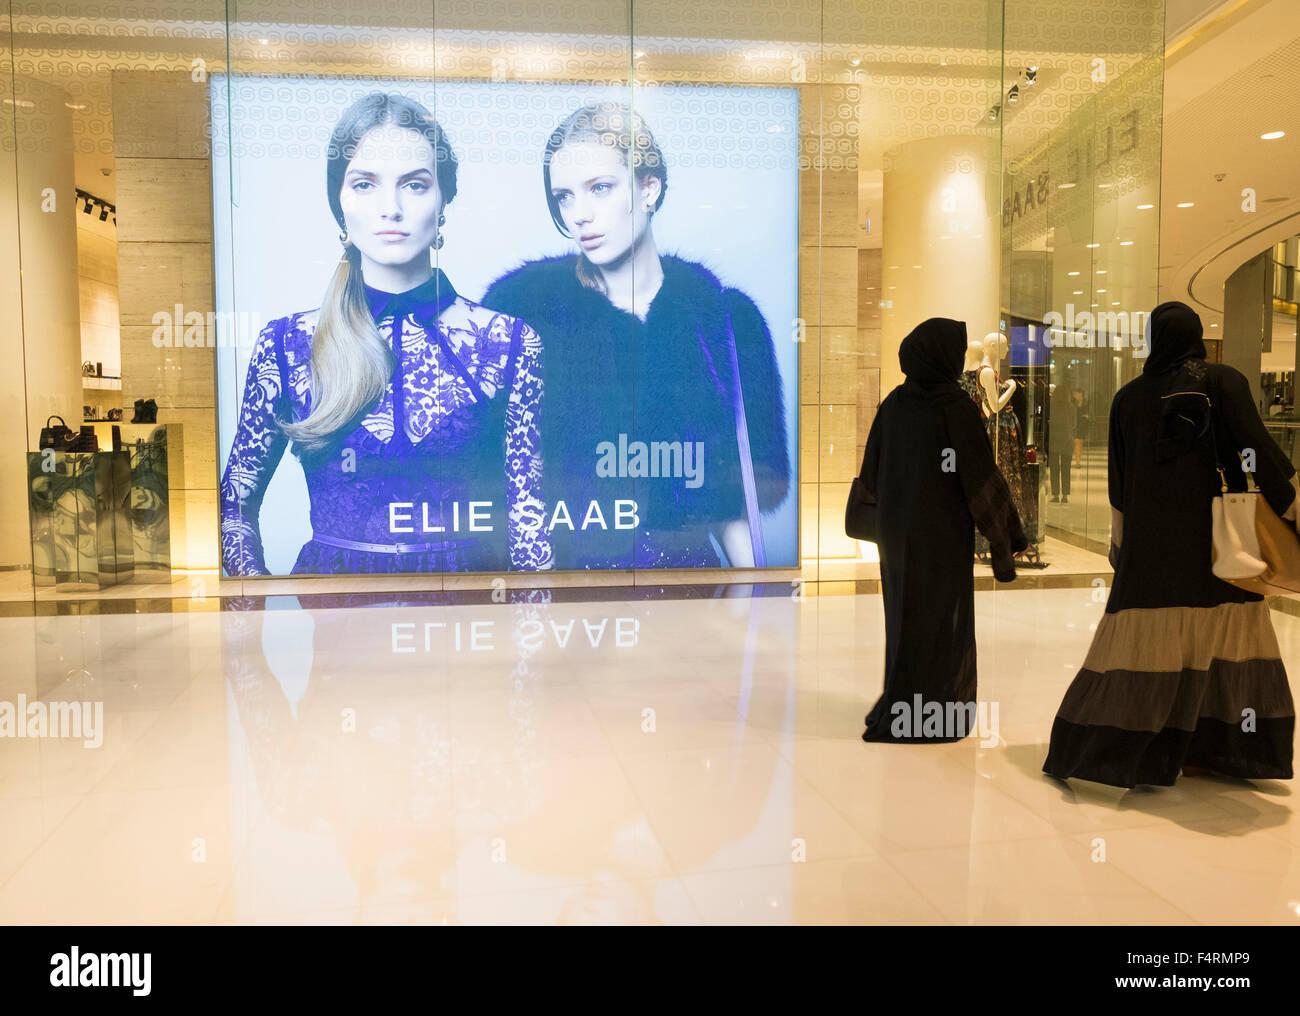 view of Elie Saab fashion boutique inside Dubai Mall in United Arab Emirates - Stock Image